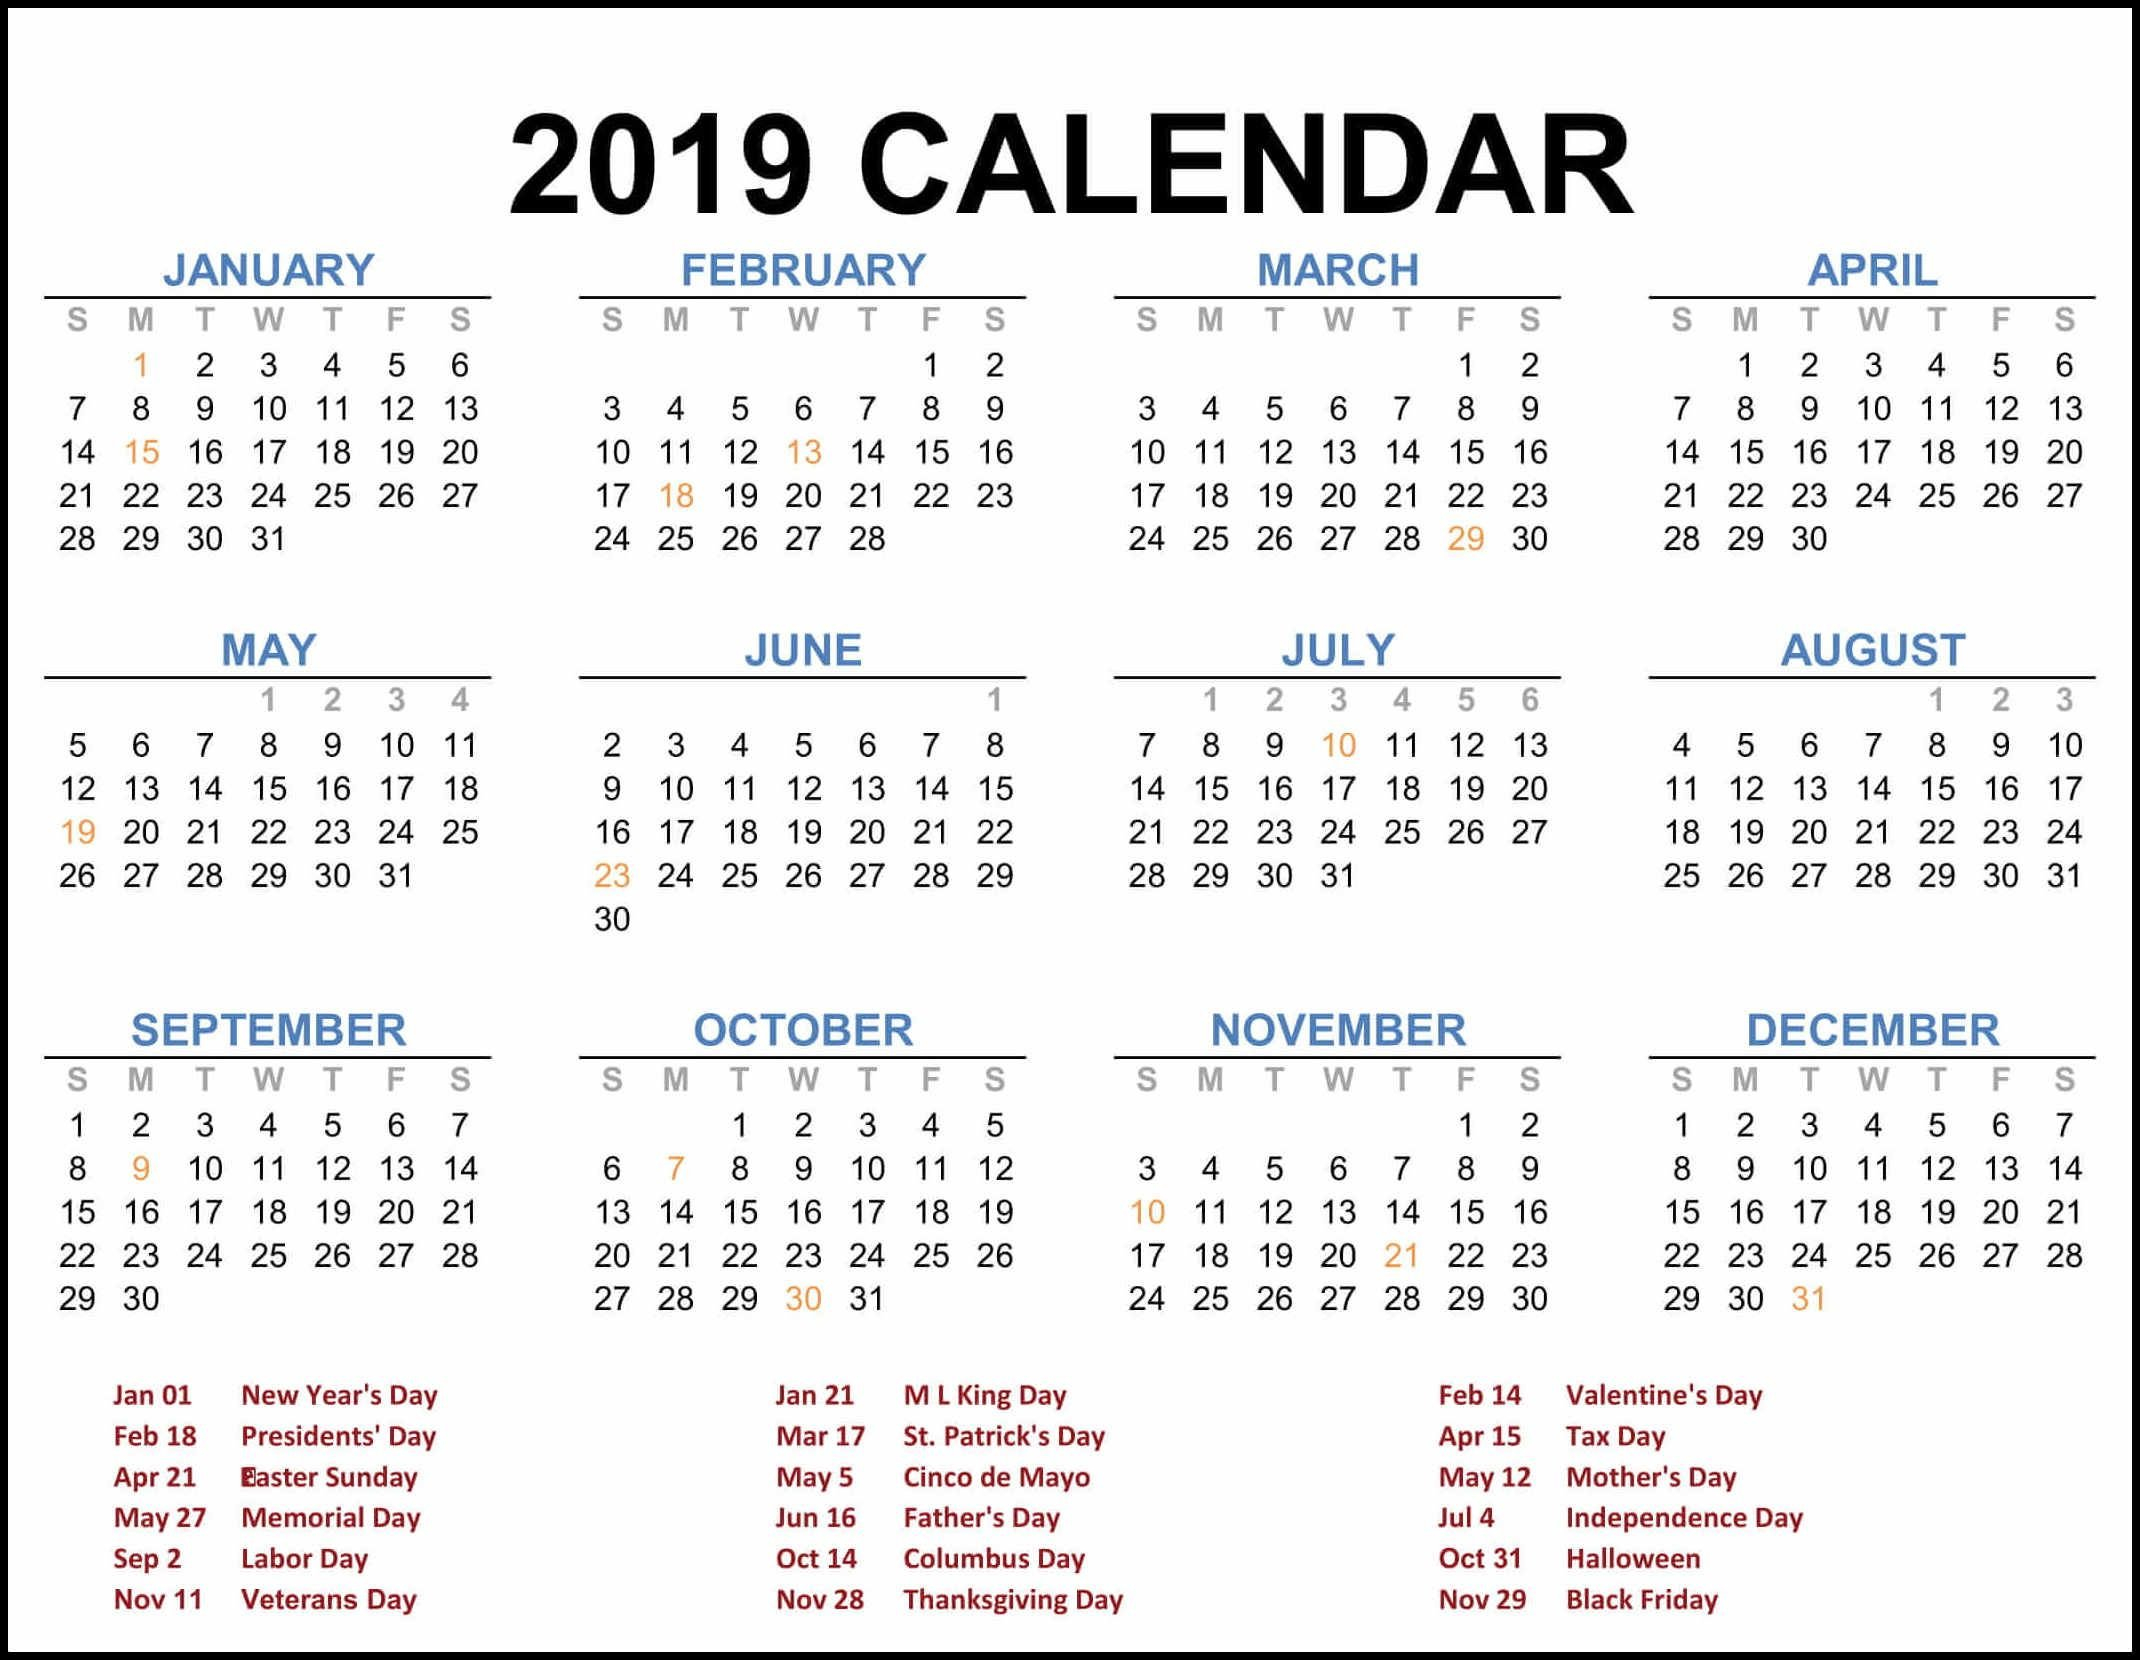 2019 Federal Holiday Calendar   2019 Calendar Template In One Pages Calendar 2019 With Federal Holidays